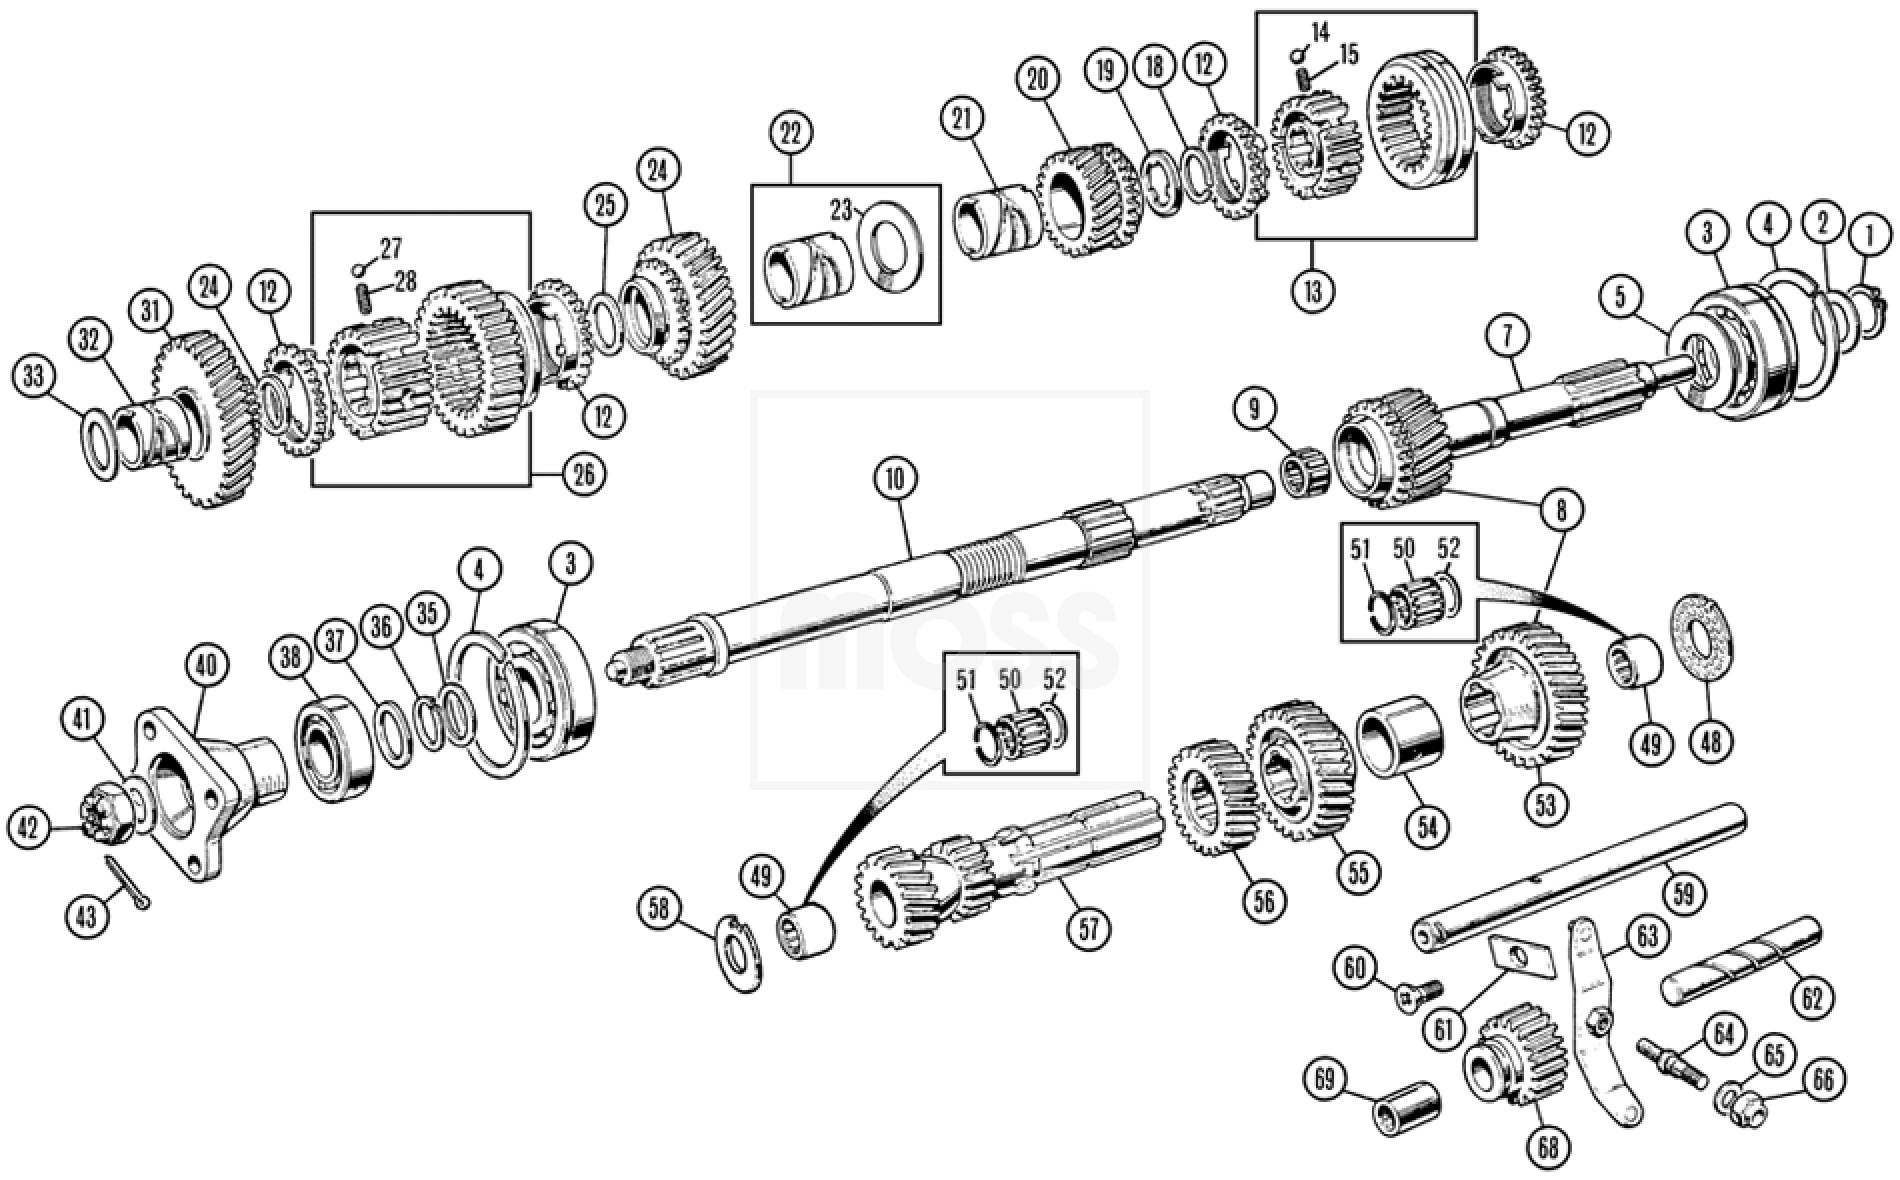 Skyteam Wiring Diagram Besides Honda Ct70 Wiring Diagram Besides Honda